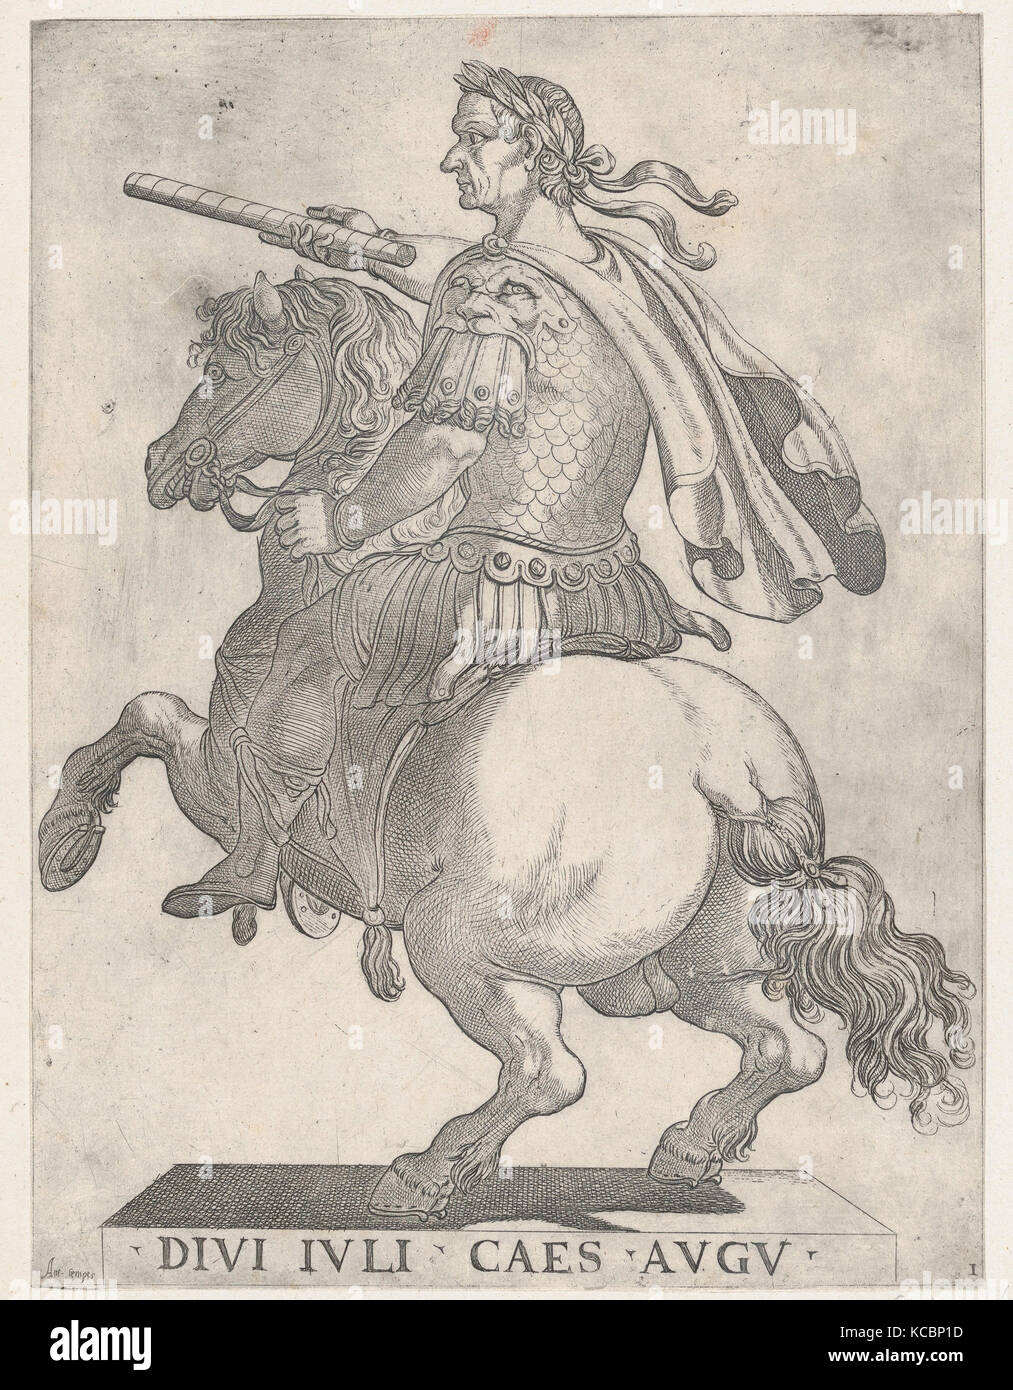 Emperor julius caesar stock photos emperor julius caesar stock plate 1 emperor julius caesar on horseback from the first twelve roman caesars buycottarizona